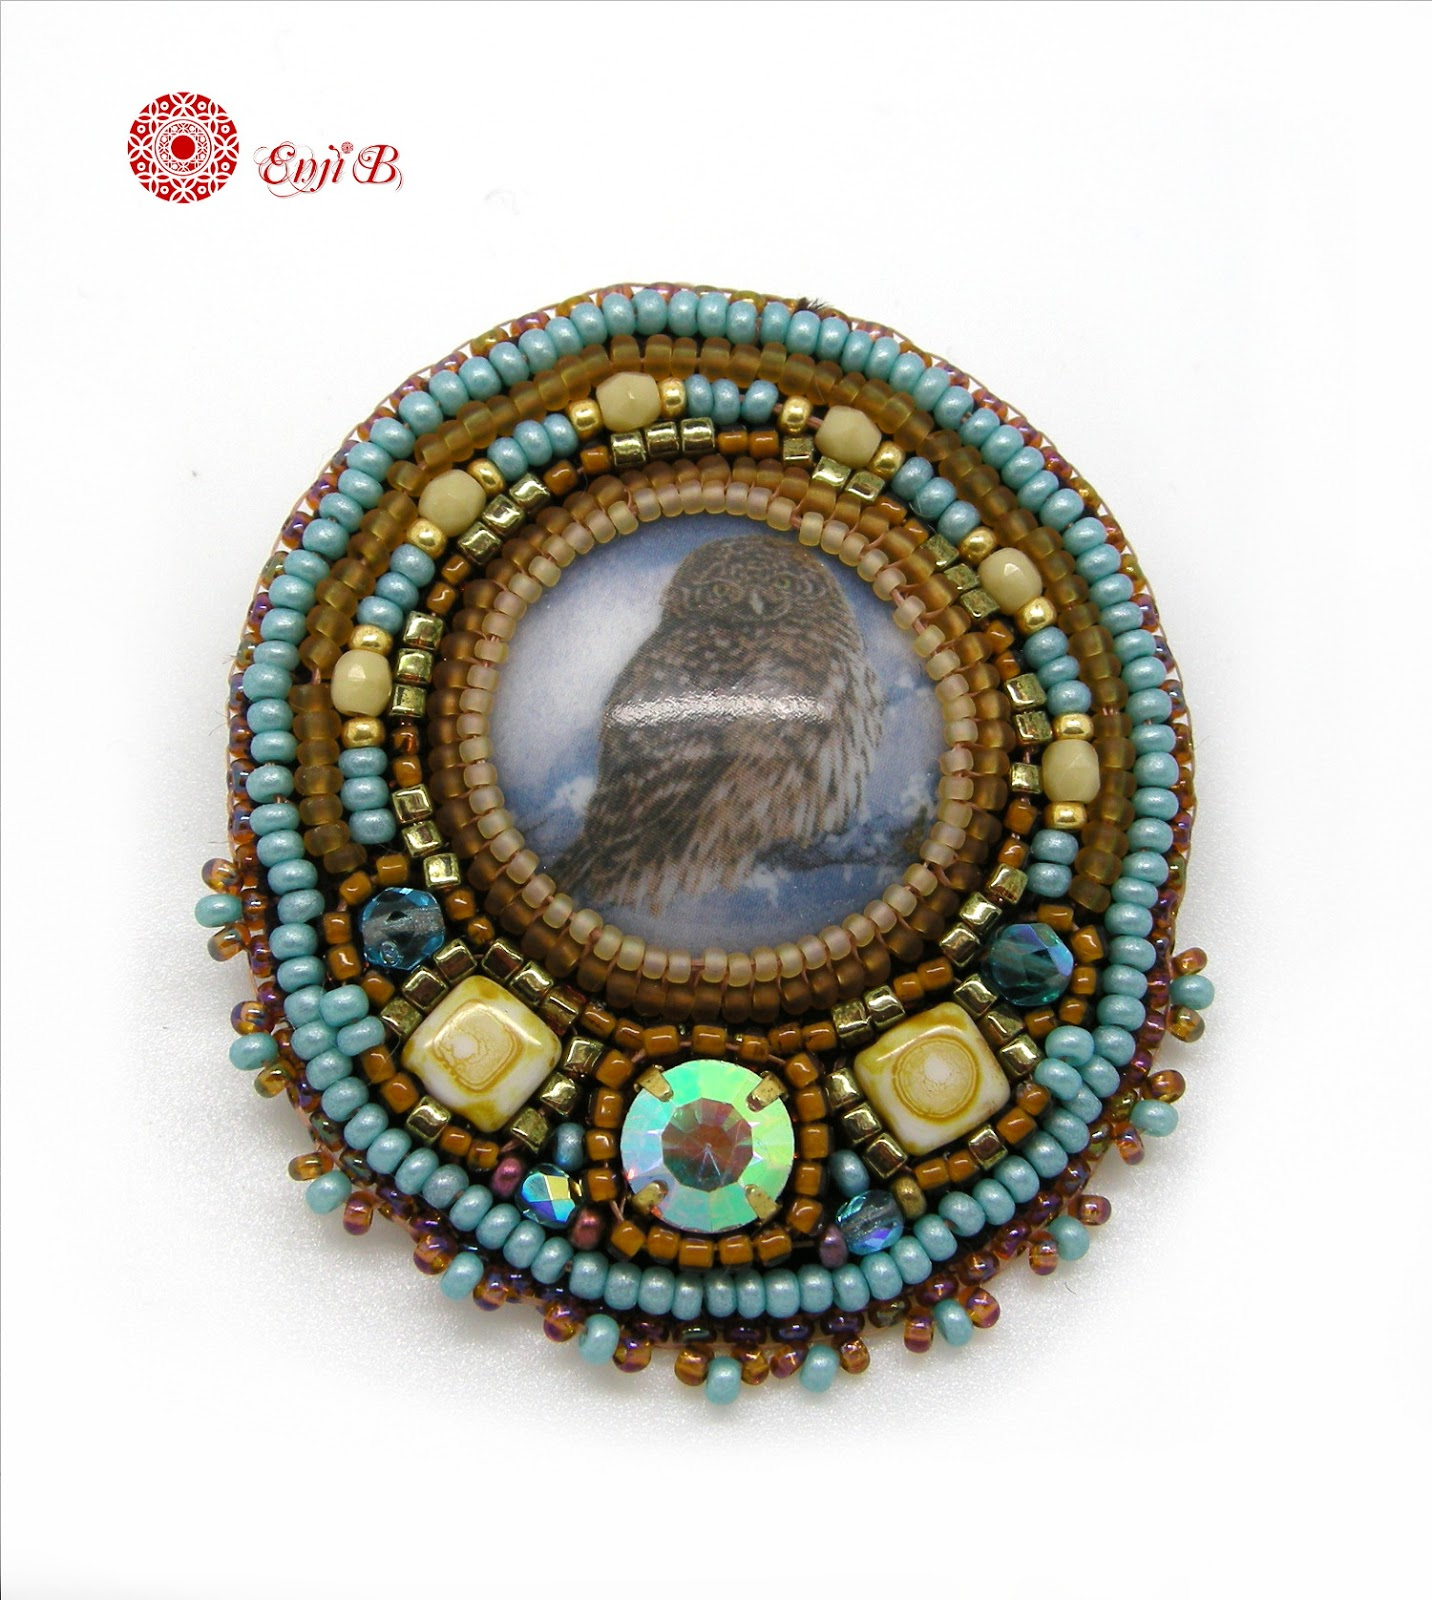 bijoux fantaisie color%C3%A9s originaux